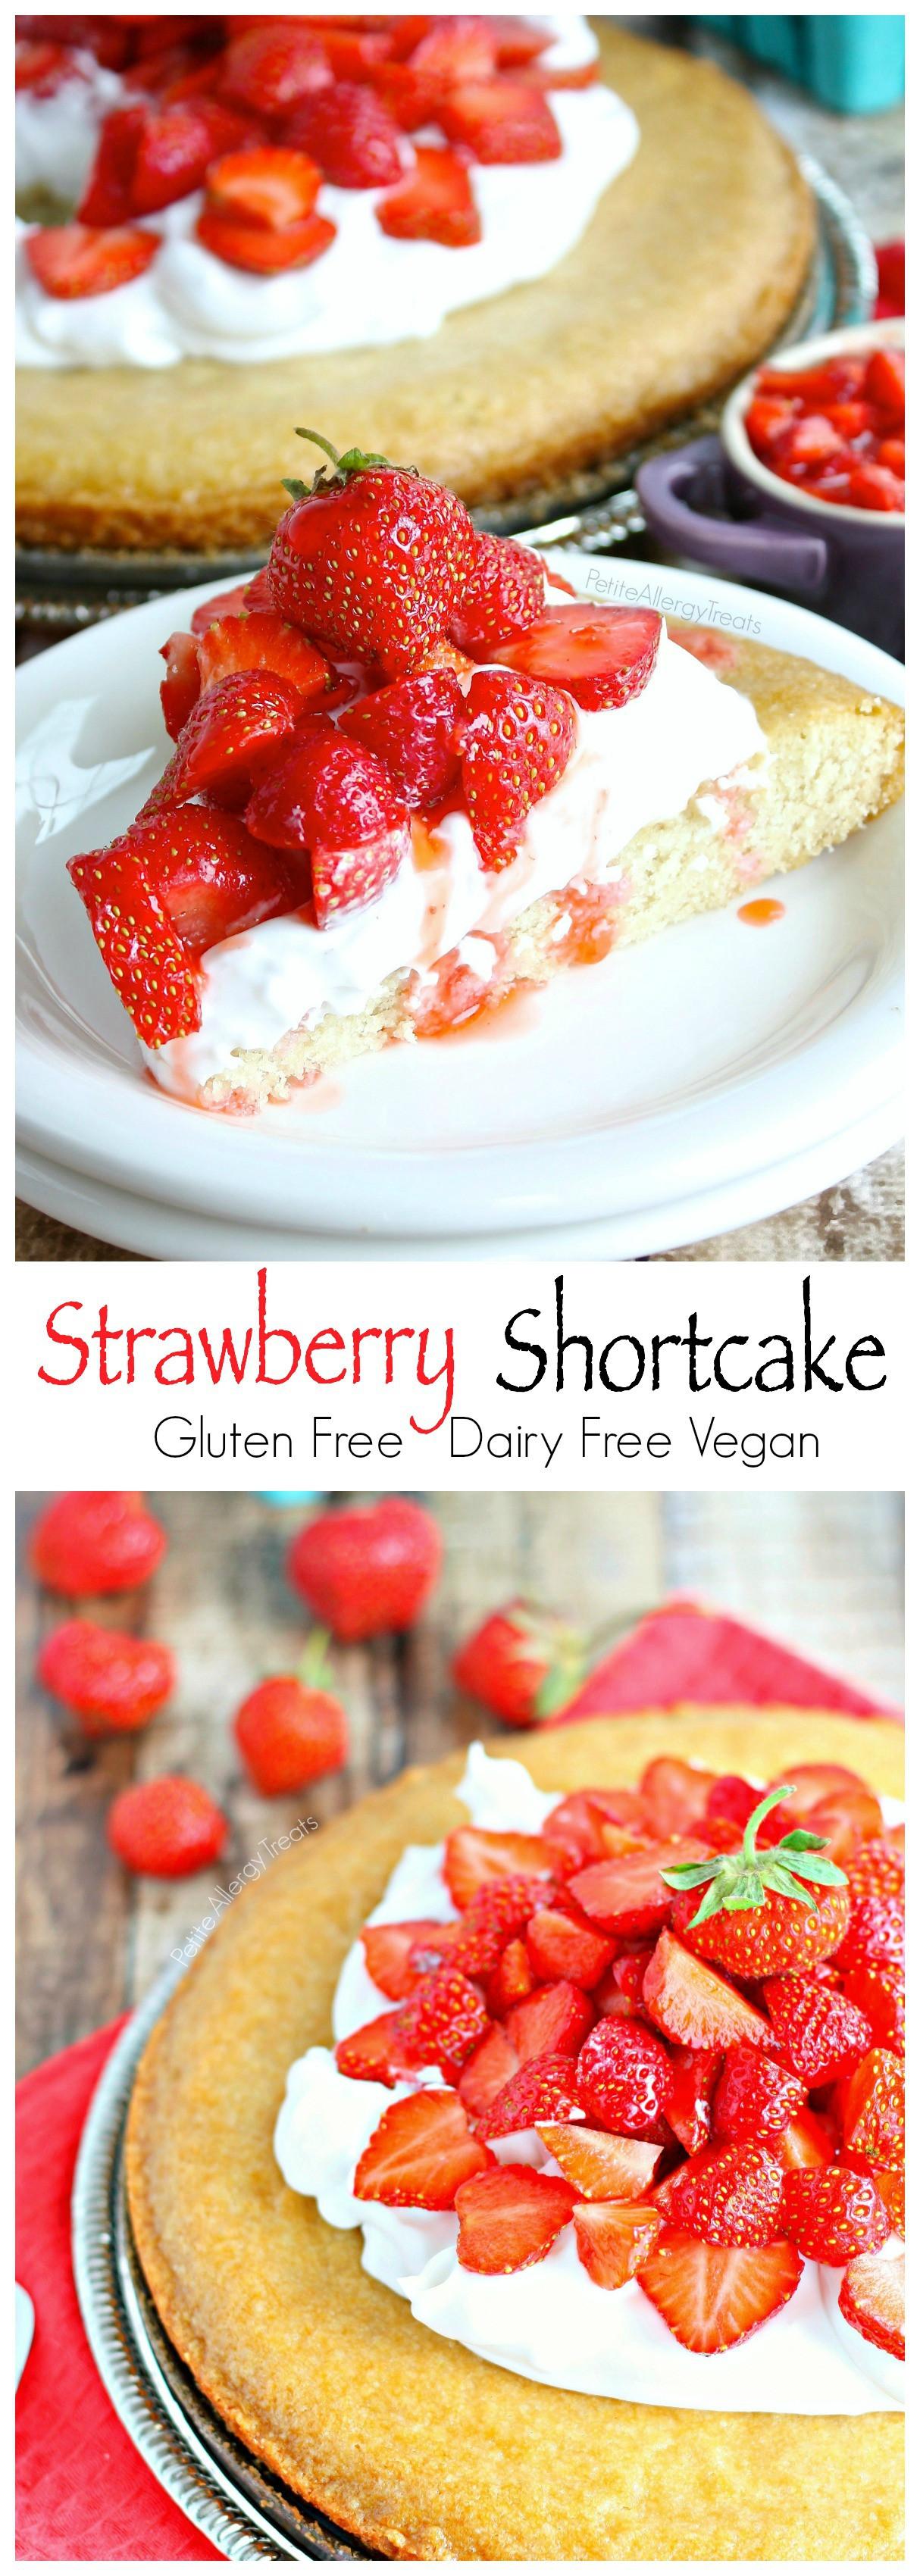 Gluten Free Dairy Free Strawberry Shortcake  Strawberry Shortcake Gluten free Vegan Petite Allergy